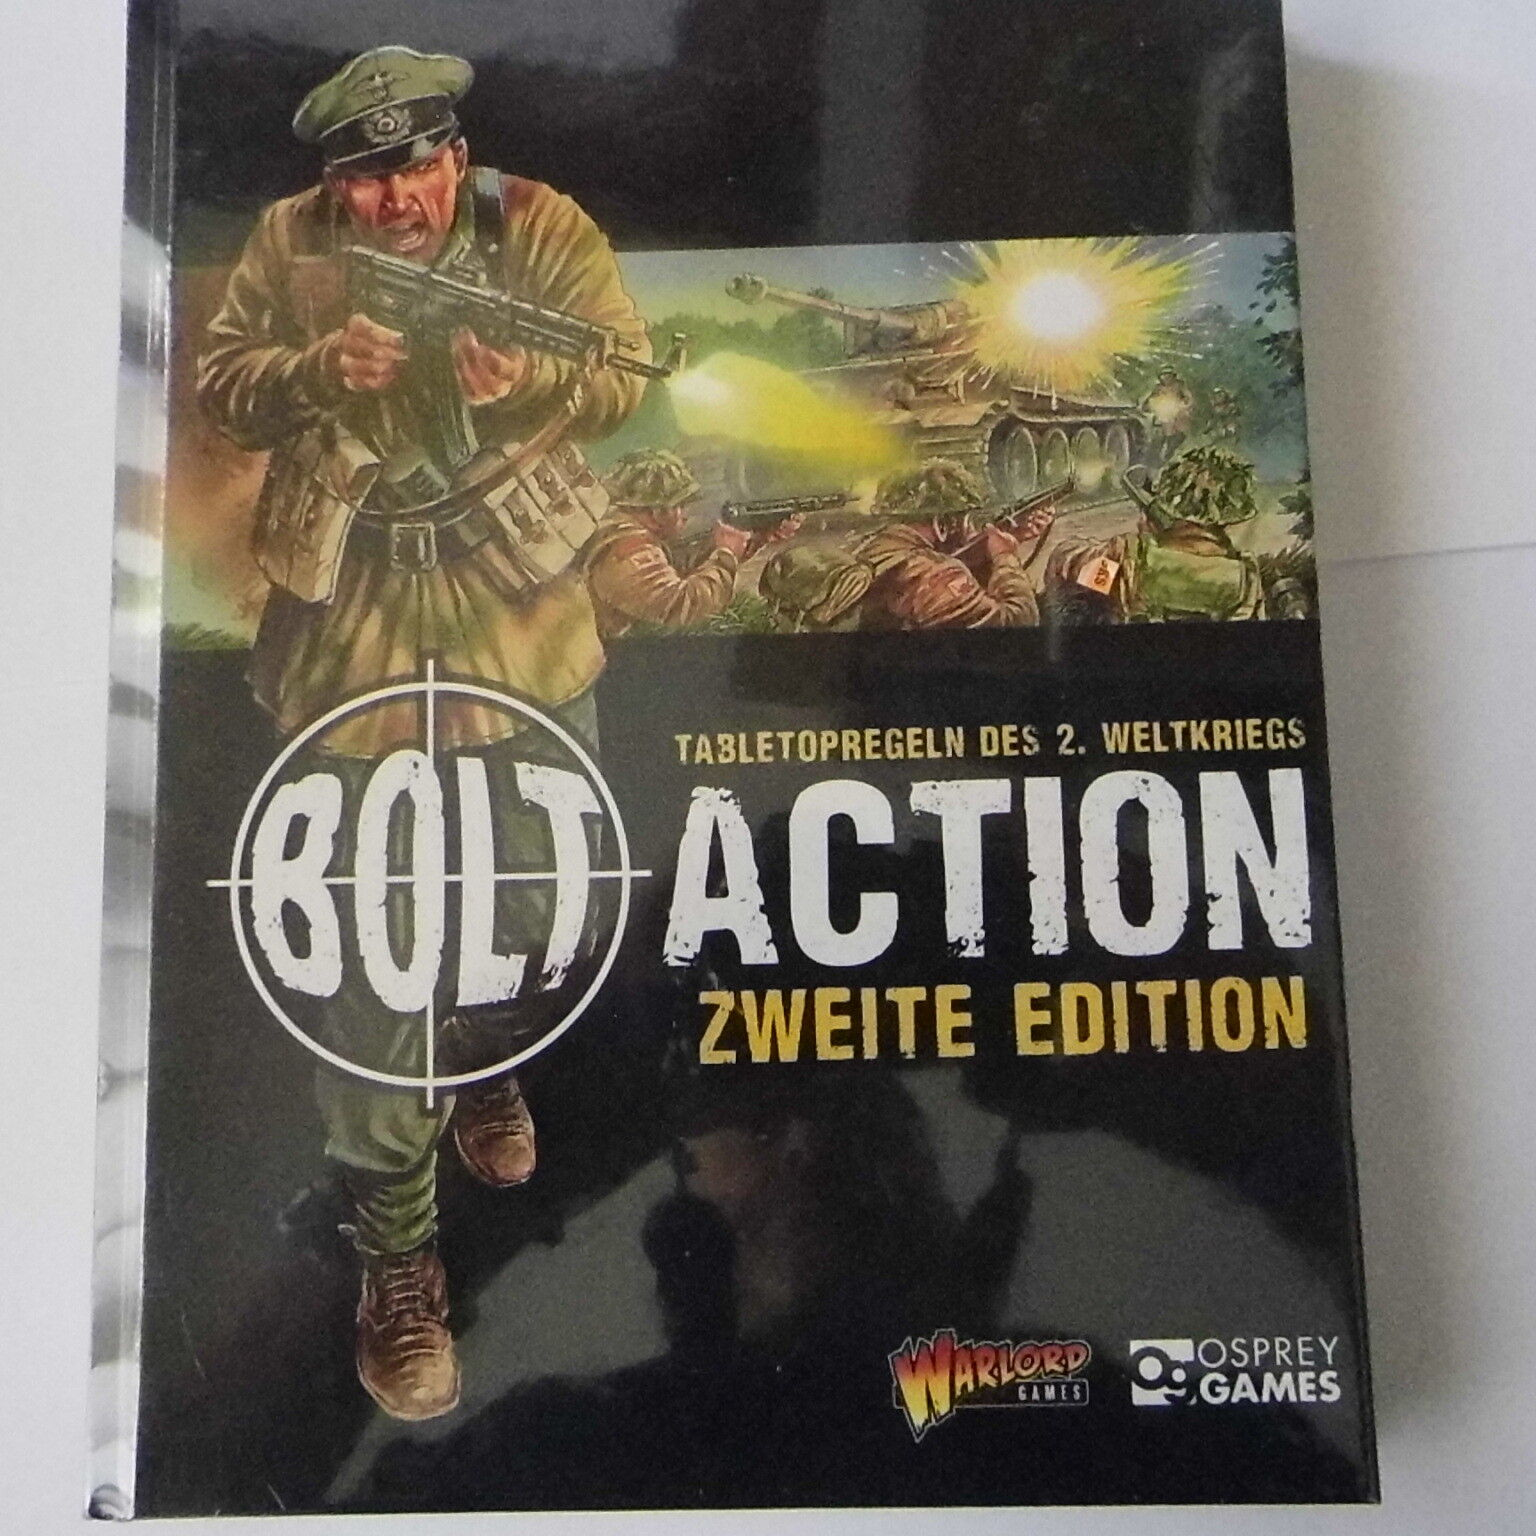 BOLT ACTION WORLD WAR II ZWEITE EDITION (GERMAN TEXT) - WARLORD GAMES